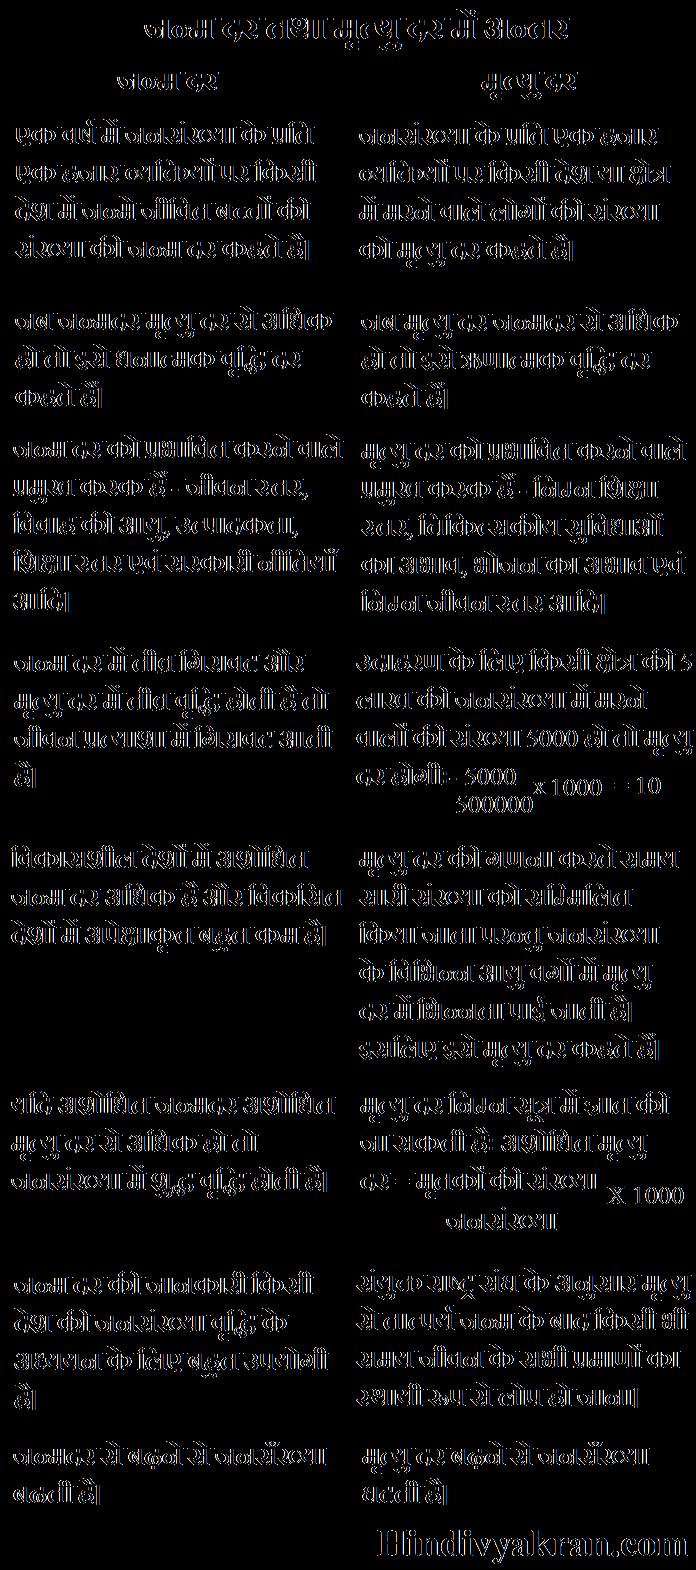 जन्म दर तथा मृत्यु दर में अंतर Janam dar aur Mrityu dar mein Antar